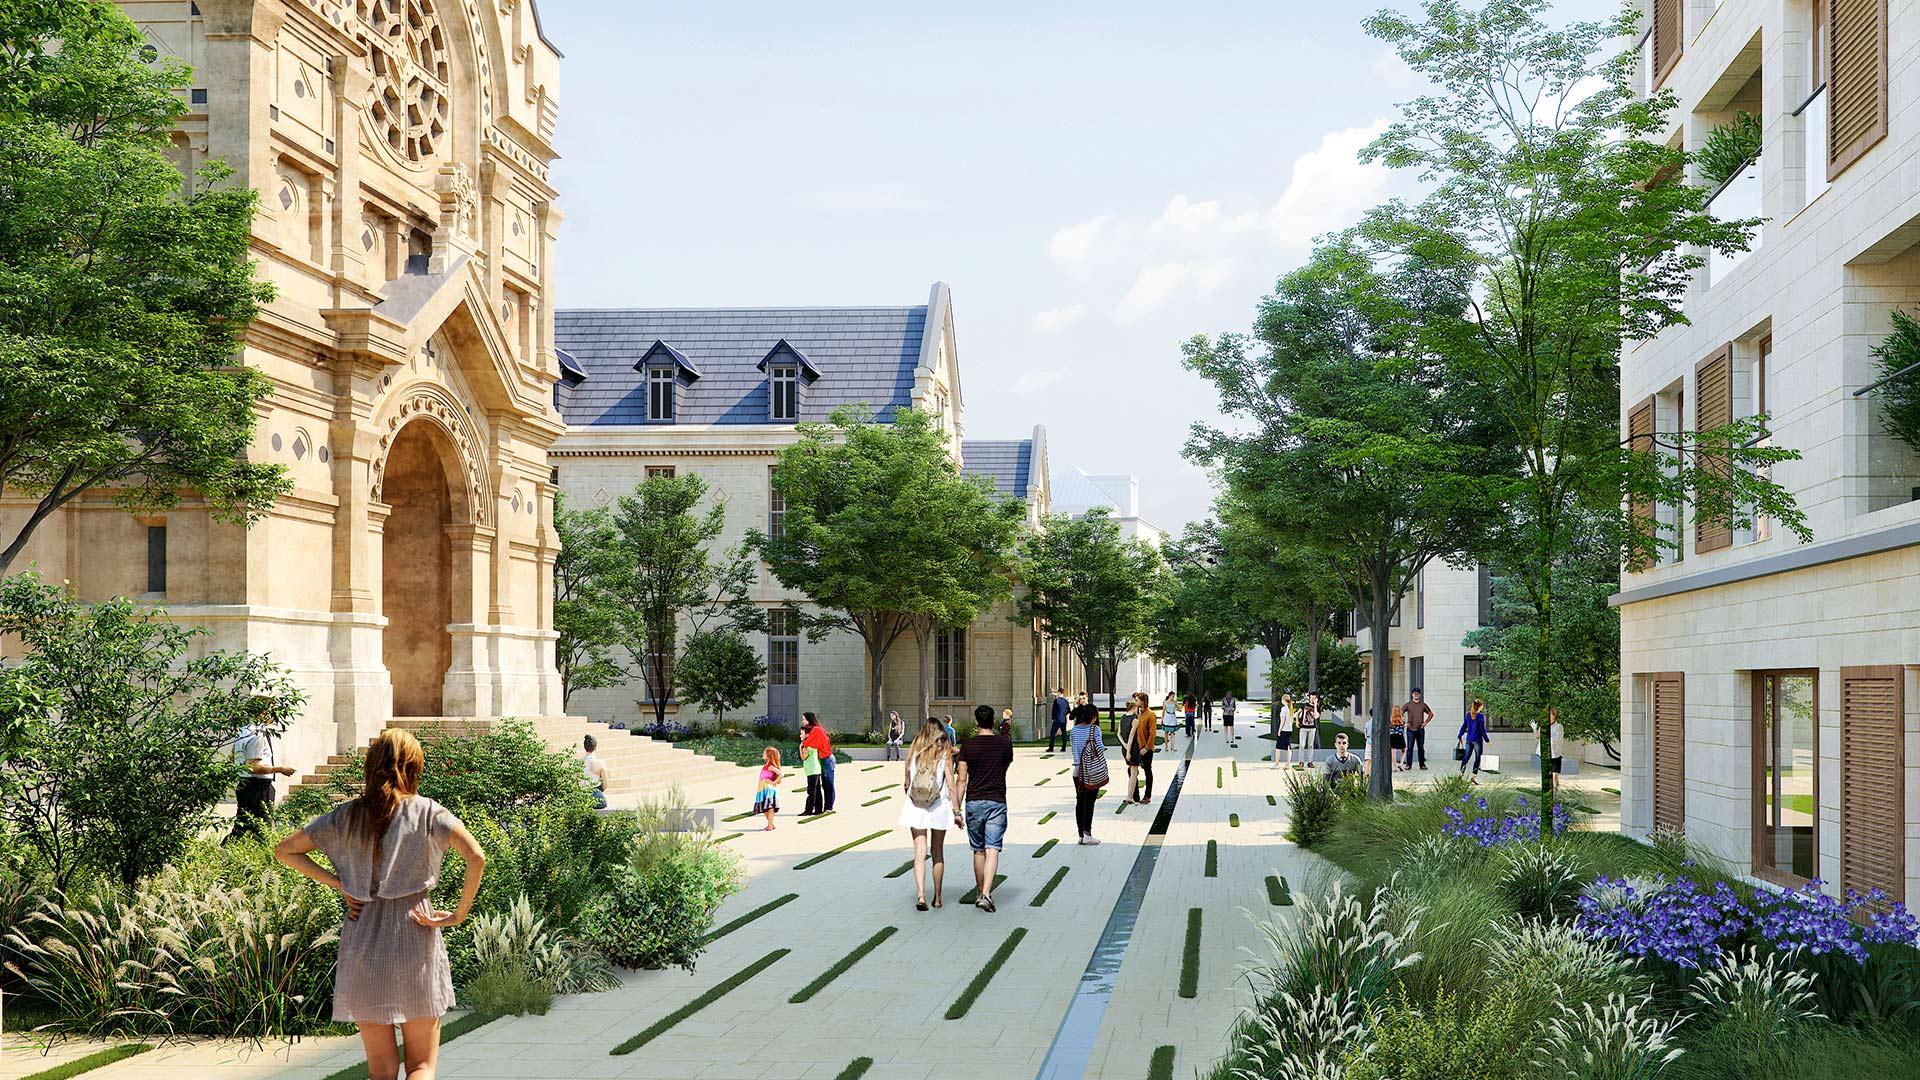 sodes-projets_en_cours_saint_germain_en_laye6